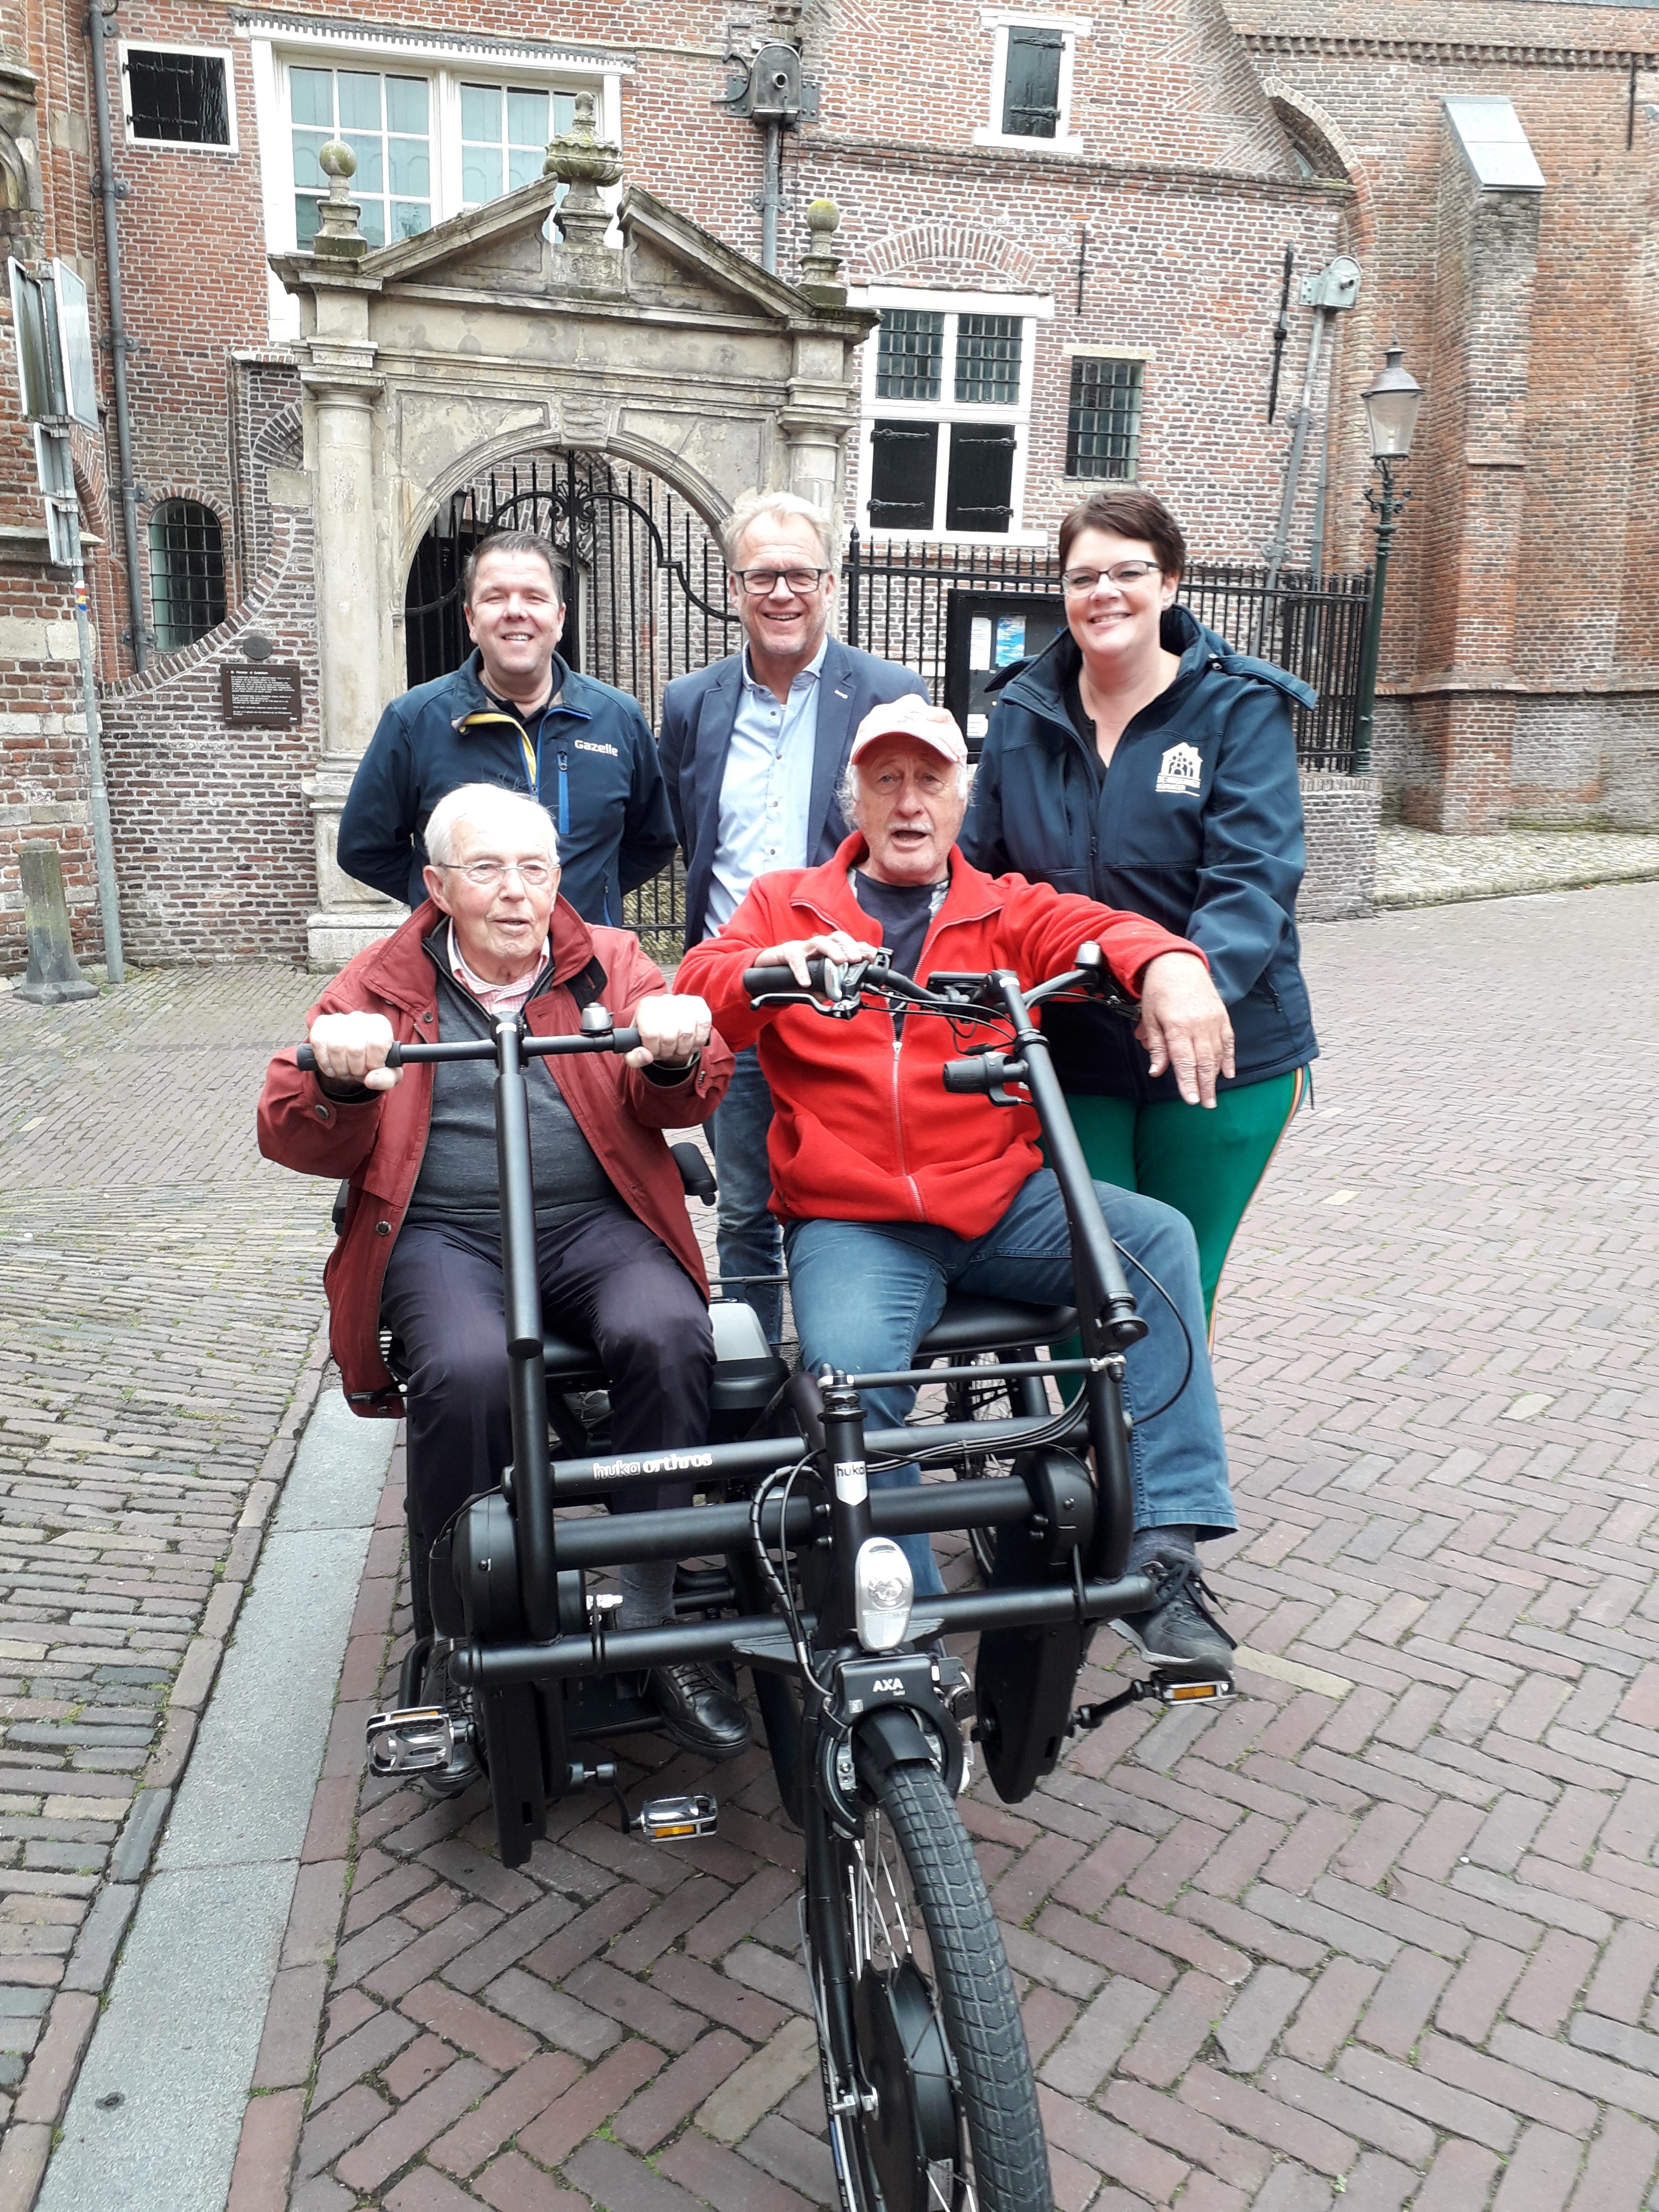 Kees van Stek, Douwe Boeijenga, Marjan Bielsma (boven v.l.n.r.) en op de fiets de heer De Wolf en Wil. (Foto: aangeleverd)